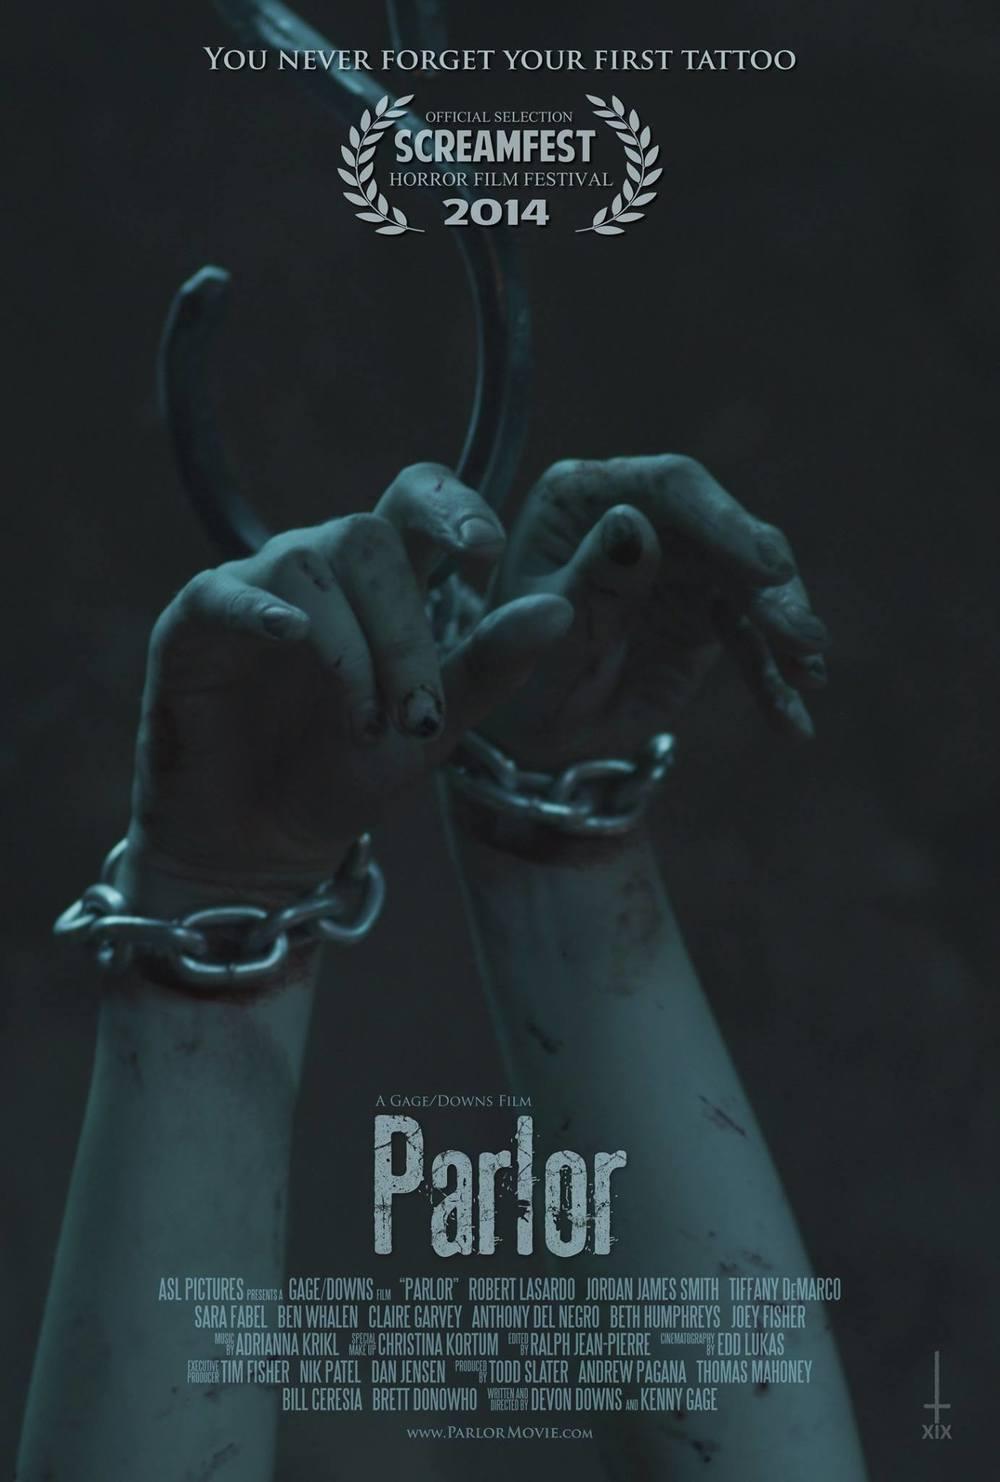 teaser poster for PARLOR.